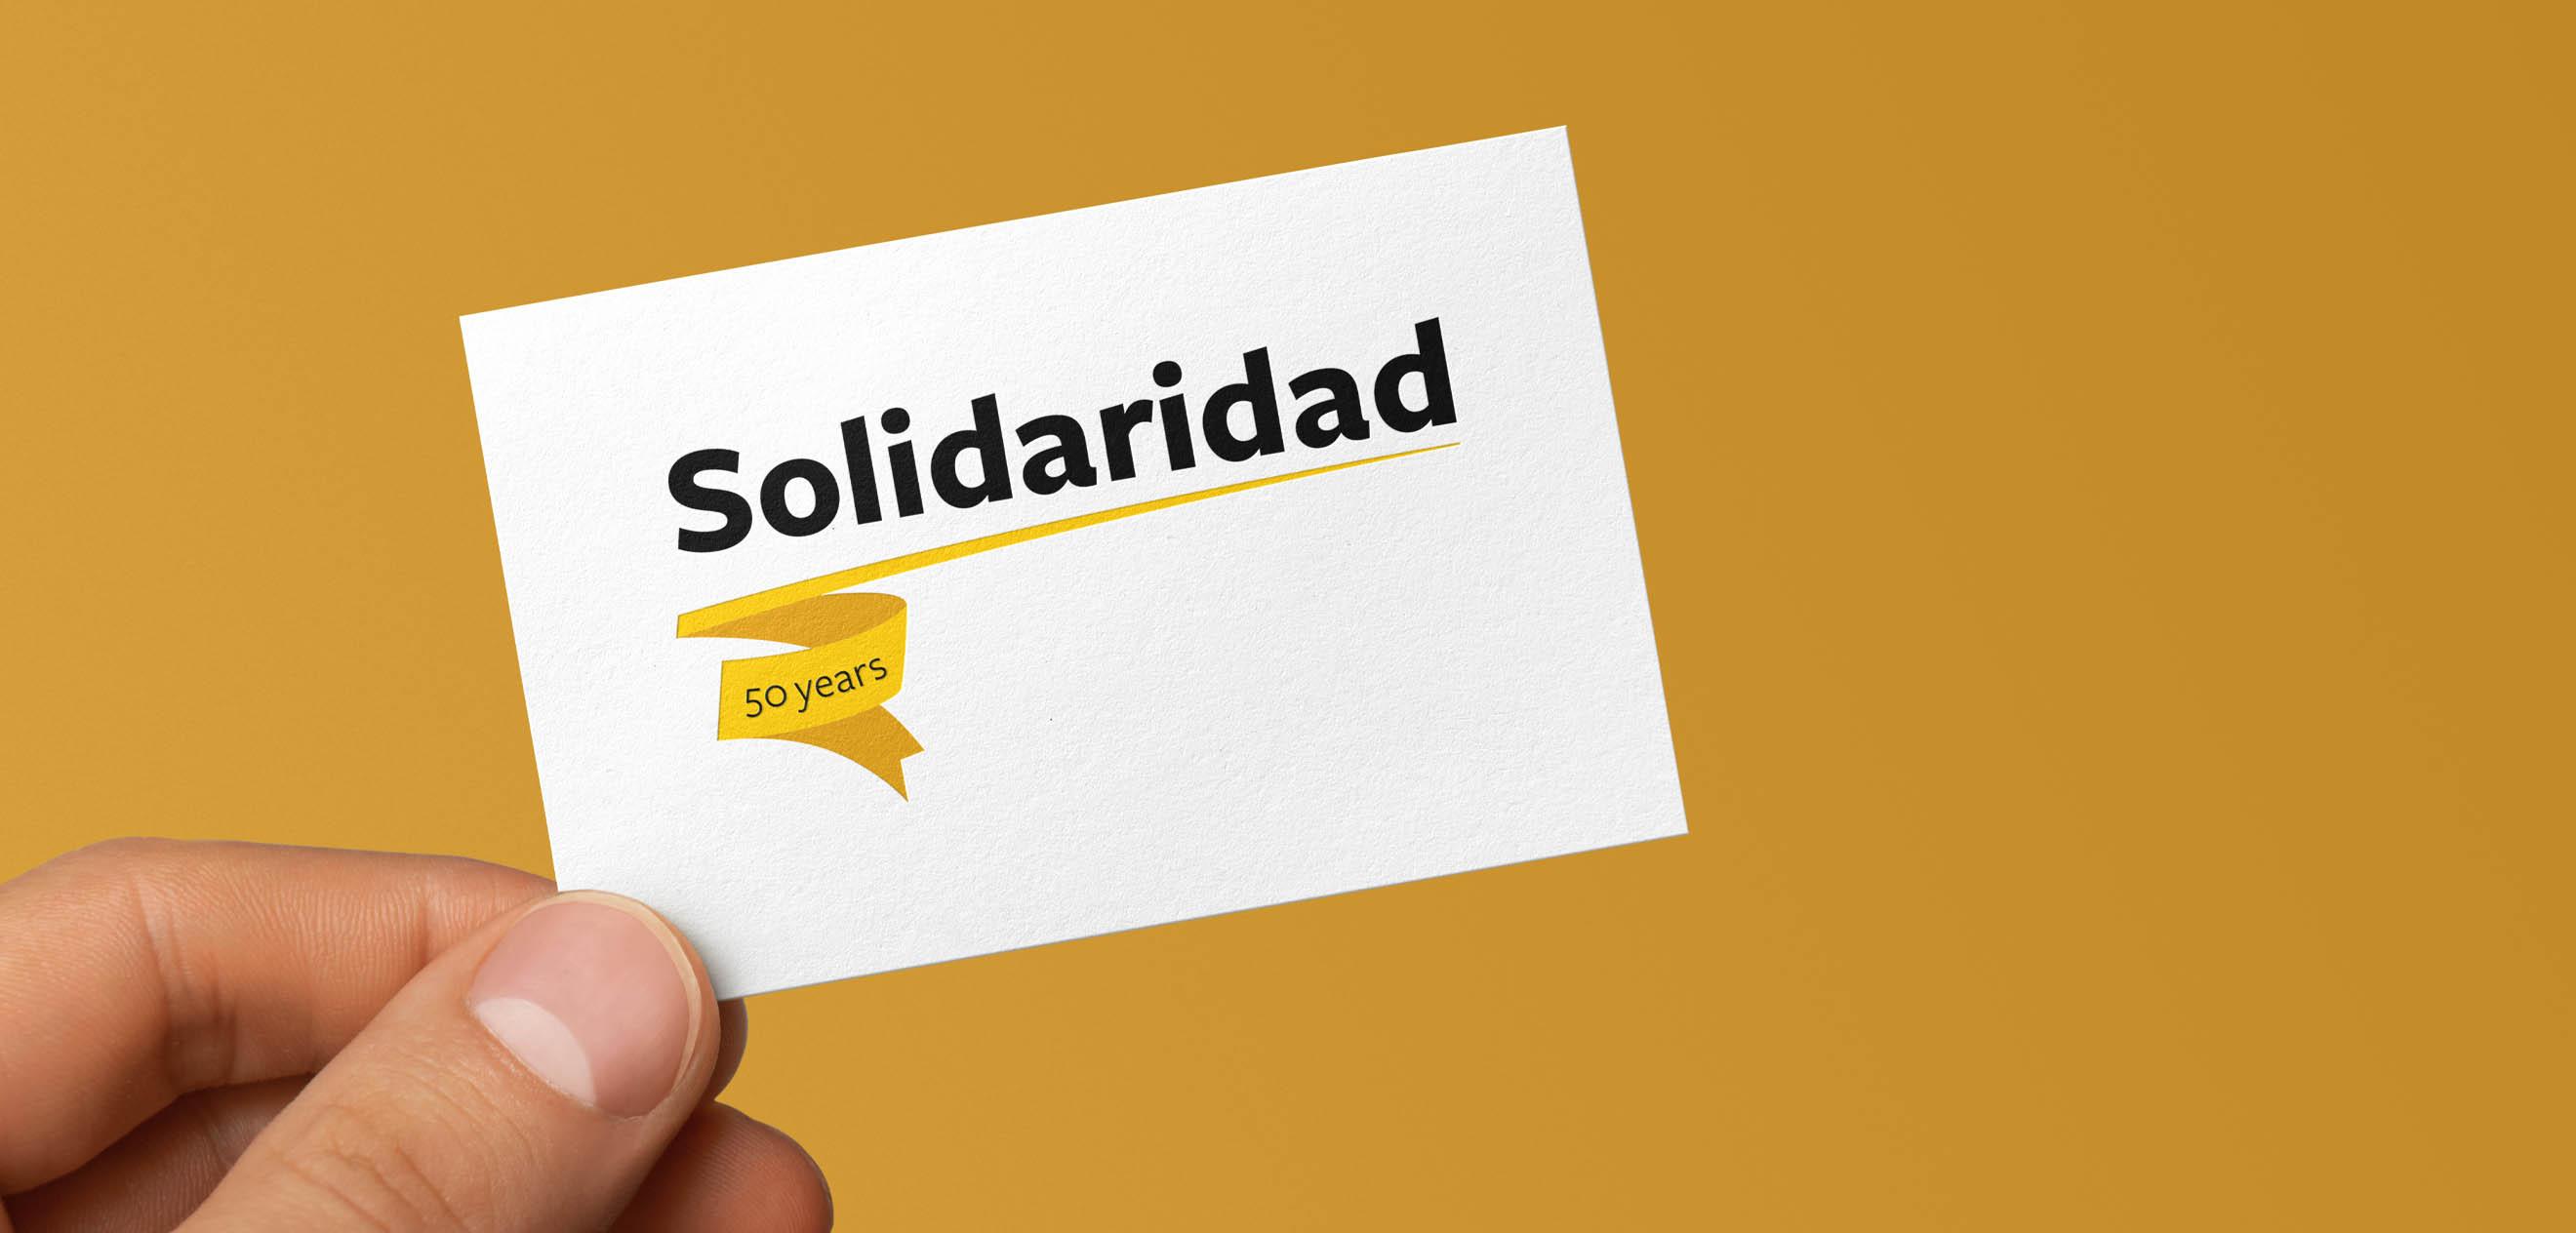 Solidaridad, jubileumlogo, logo, jubileum, 50 years, 50 jaar, animatie, gif, feest, goud, gouden, visitekaartje, business card